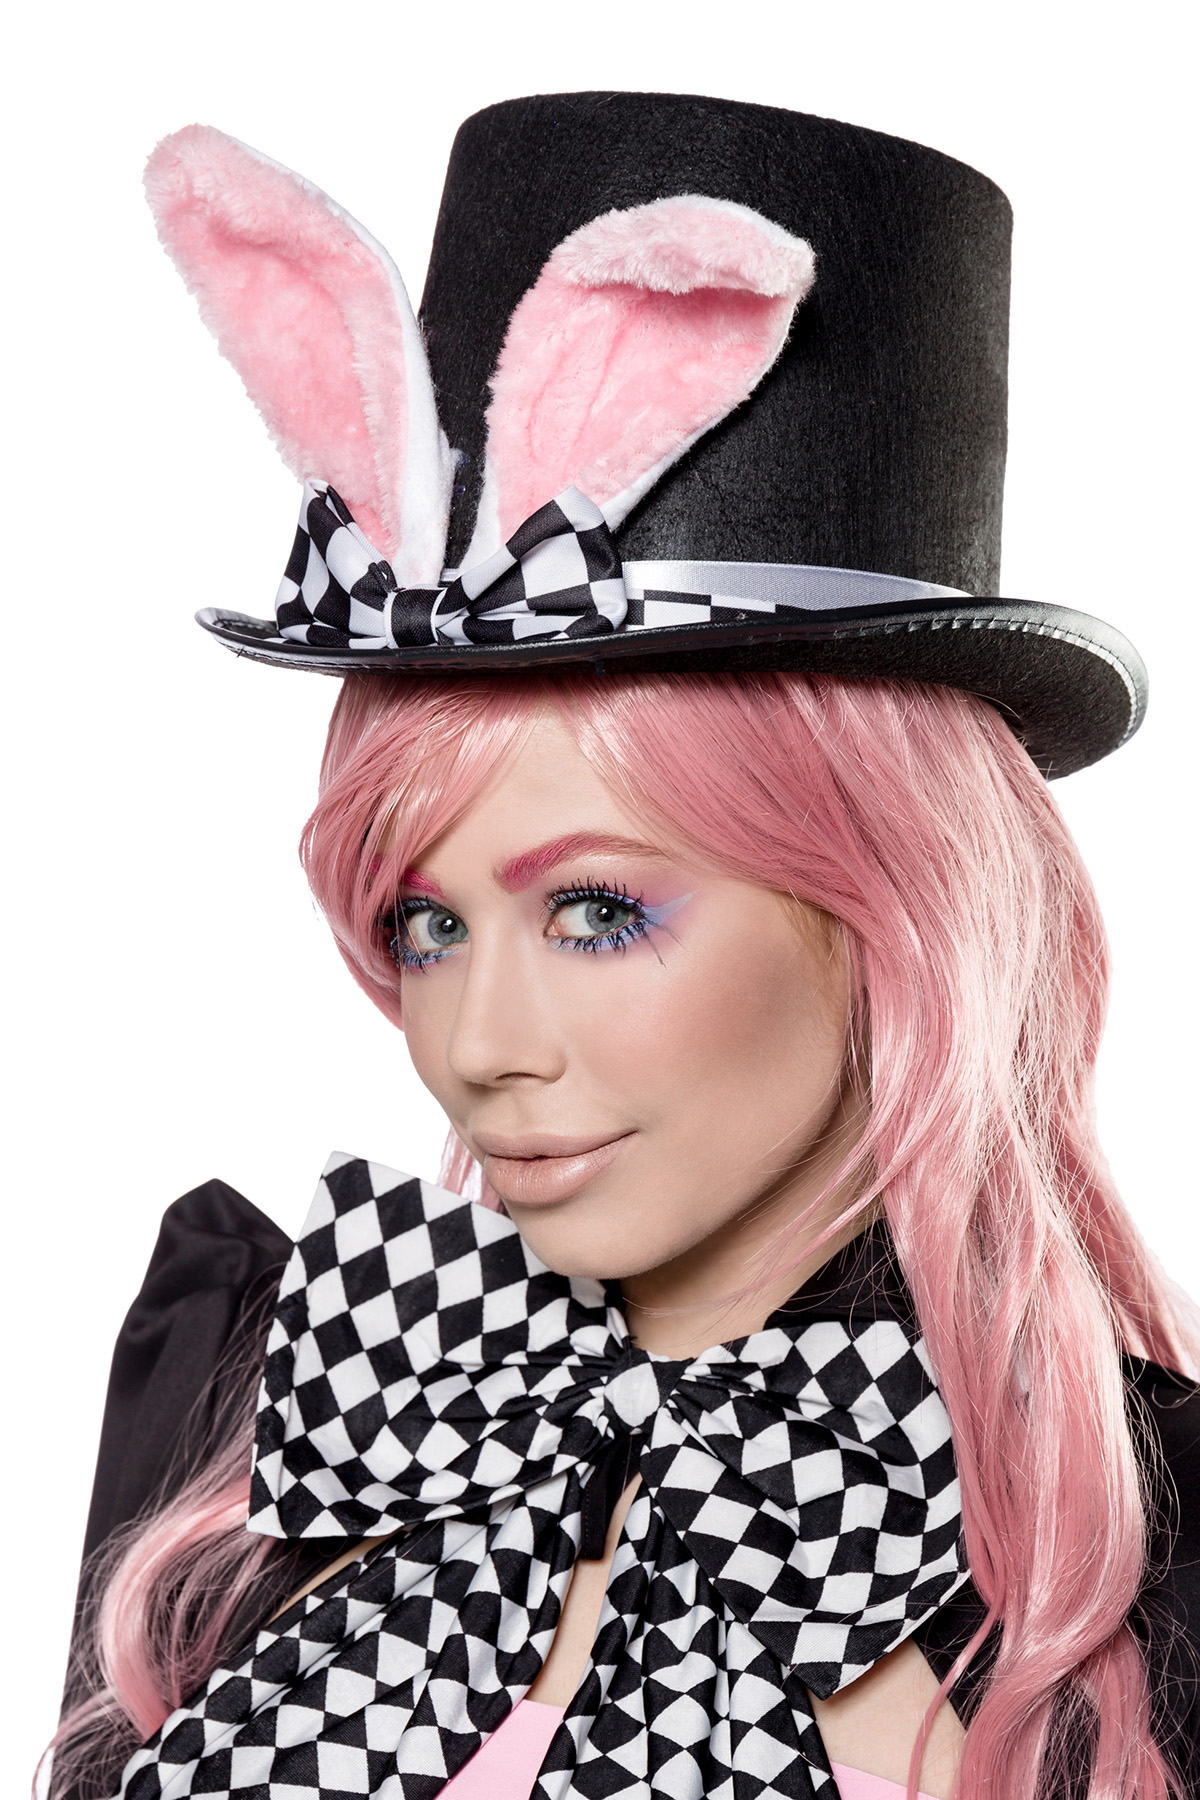 5 tlg. Bunny Hasen Kostüm Damen Komplett Kostüm Karneval S-SXL